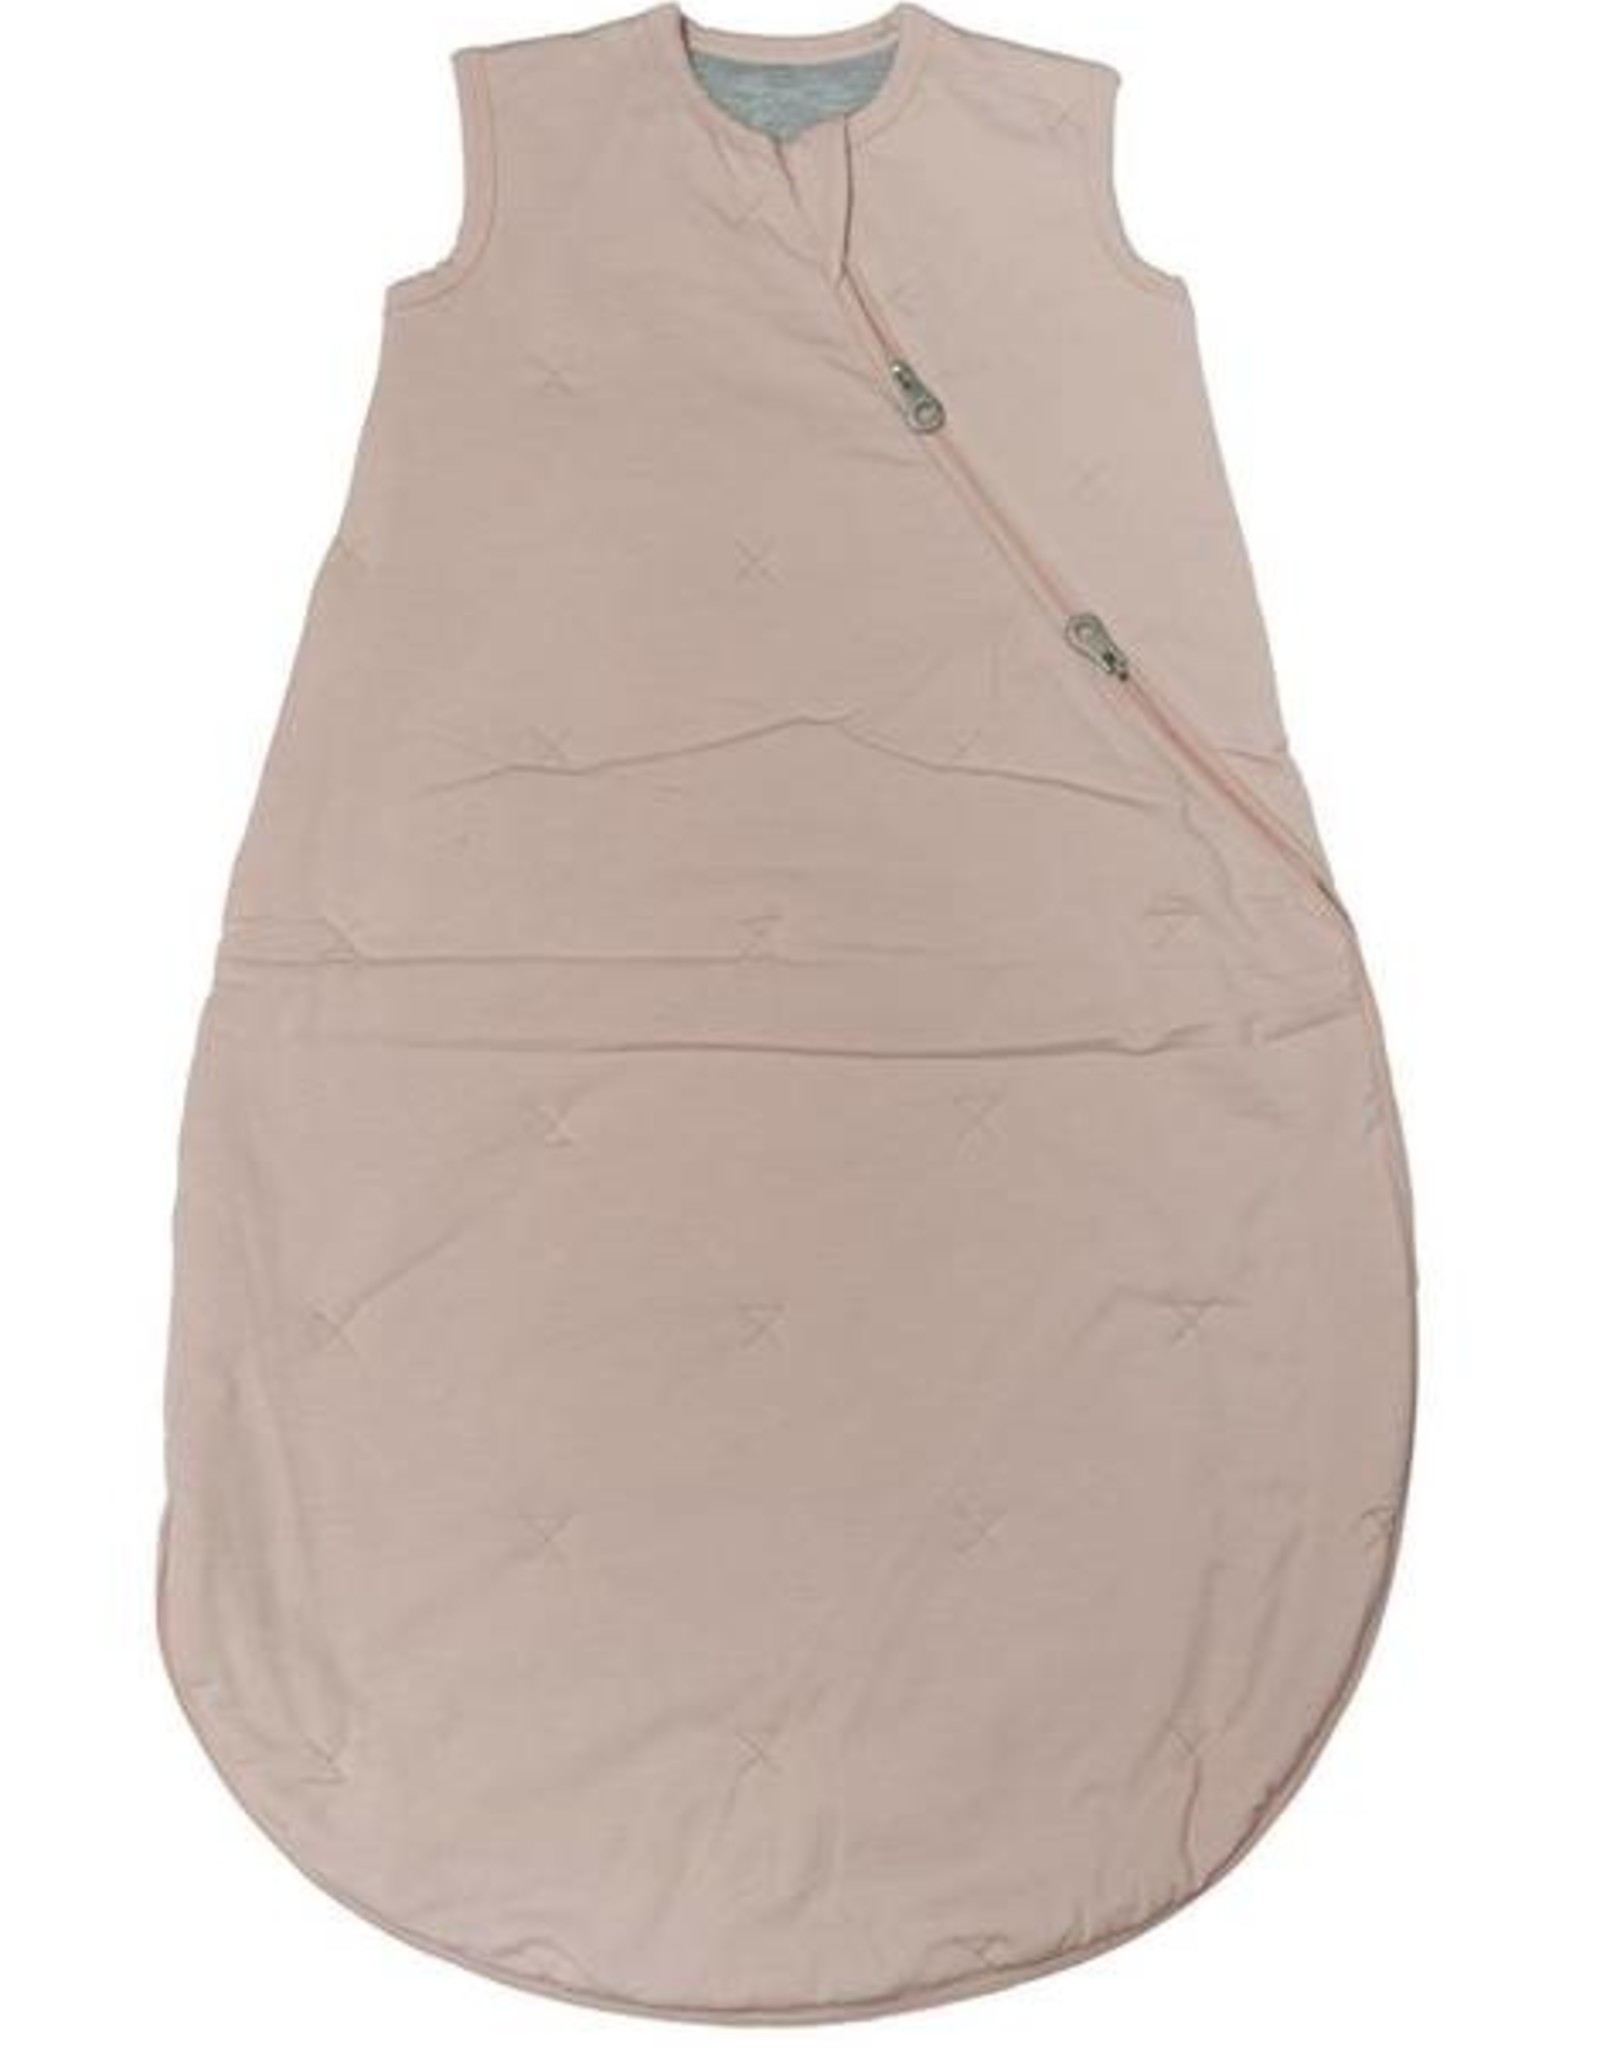 Loulou Lollipop Sleeping Bag 2.5 Tog in TENCEL - Sepia Rose